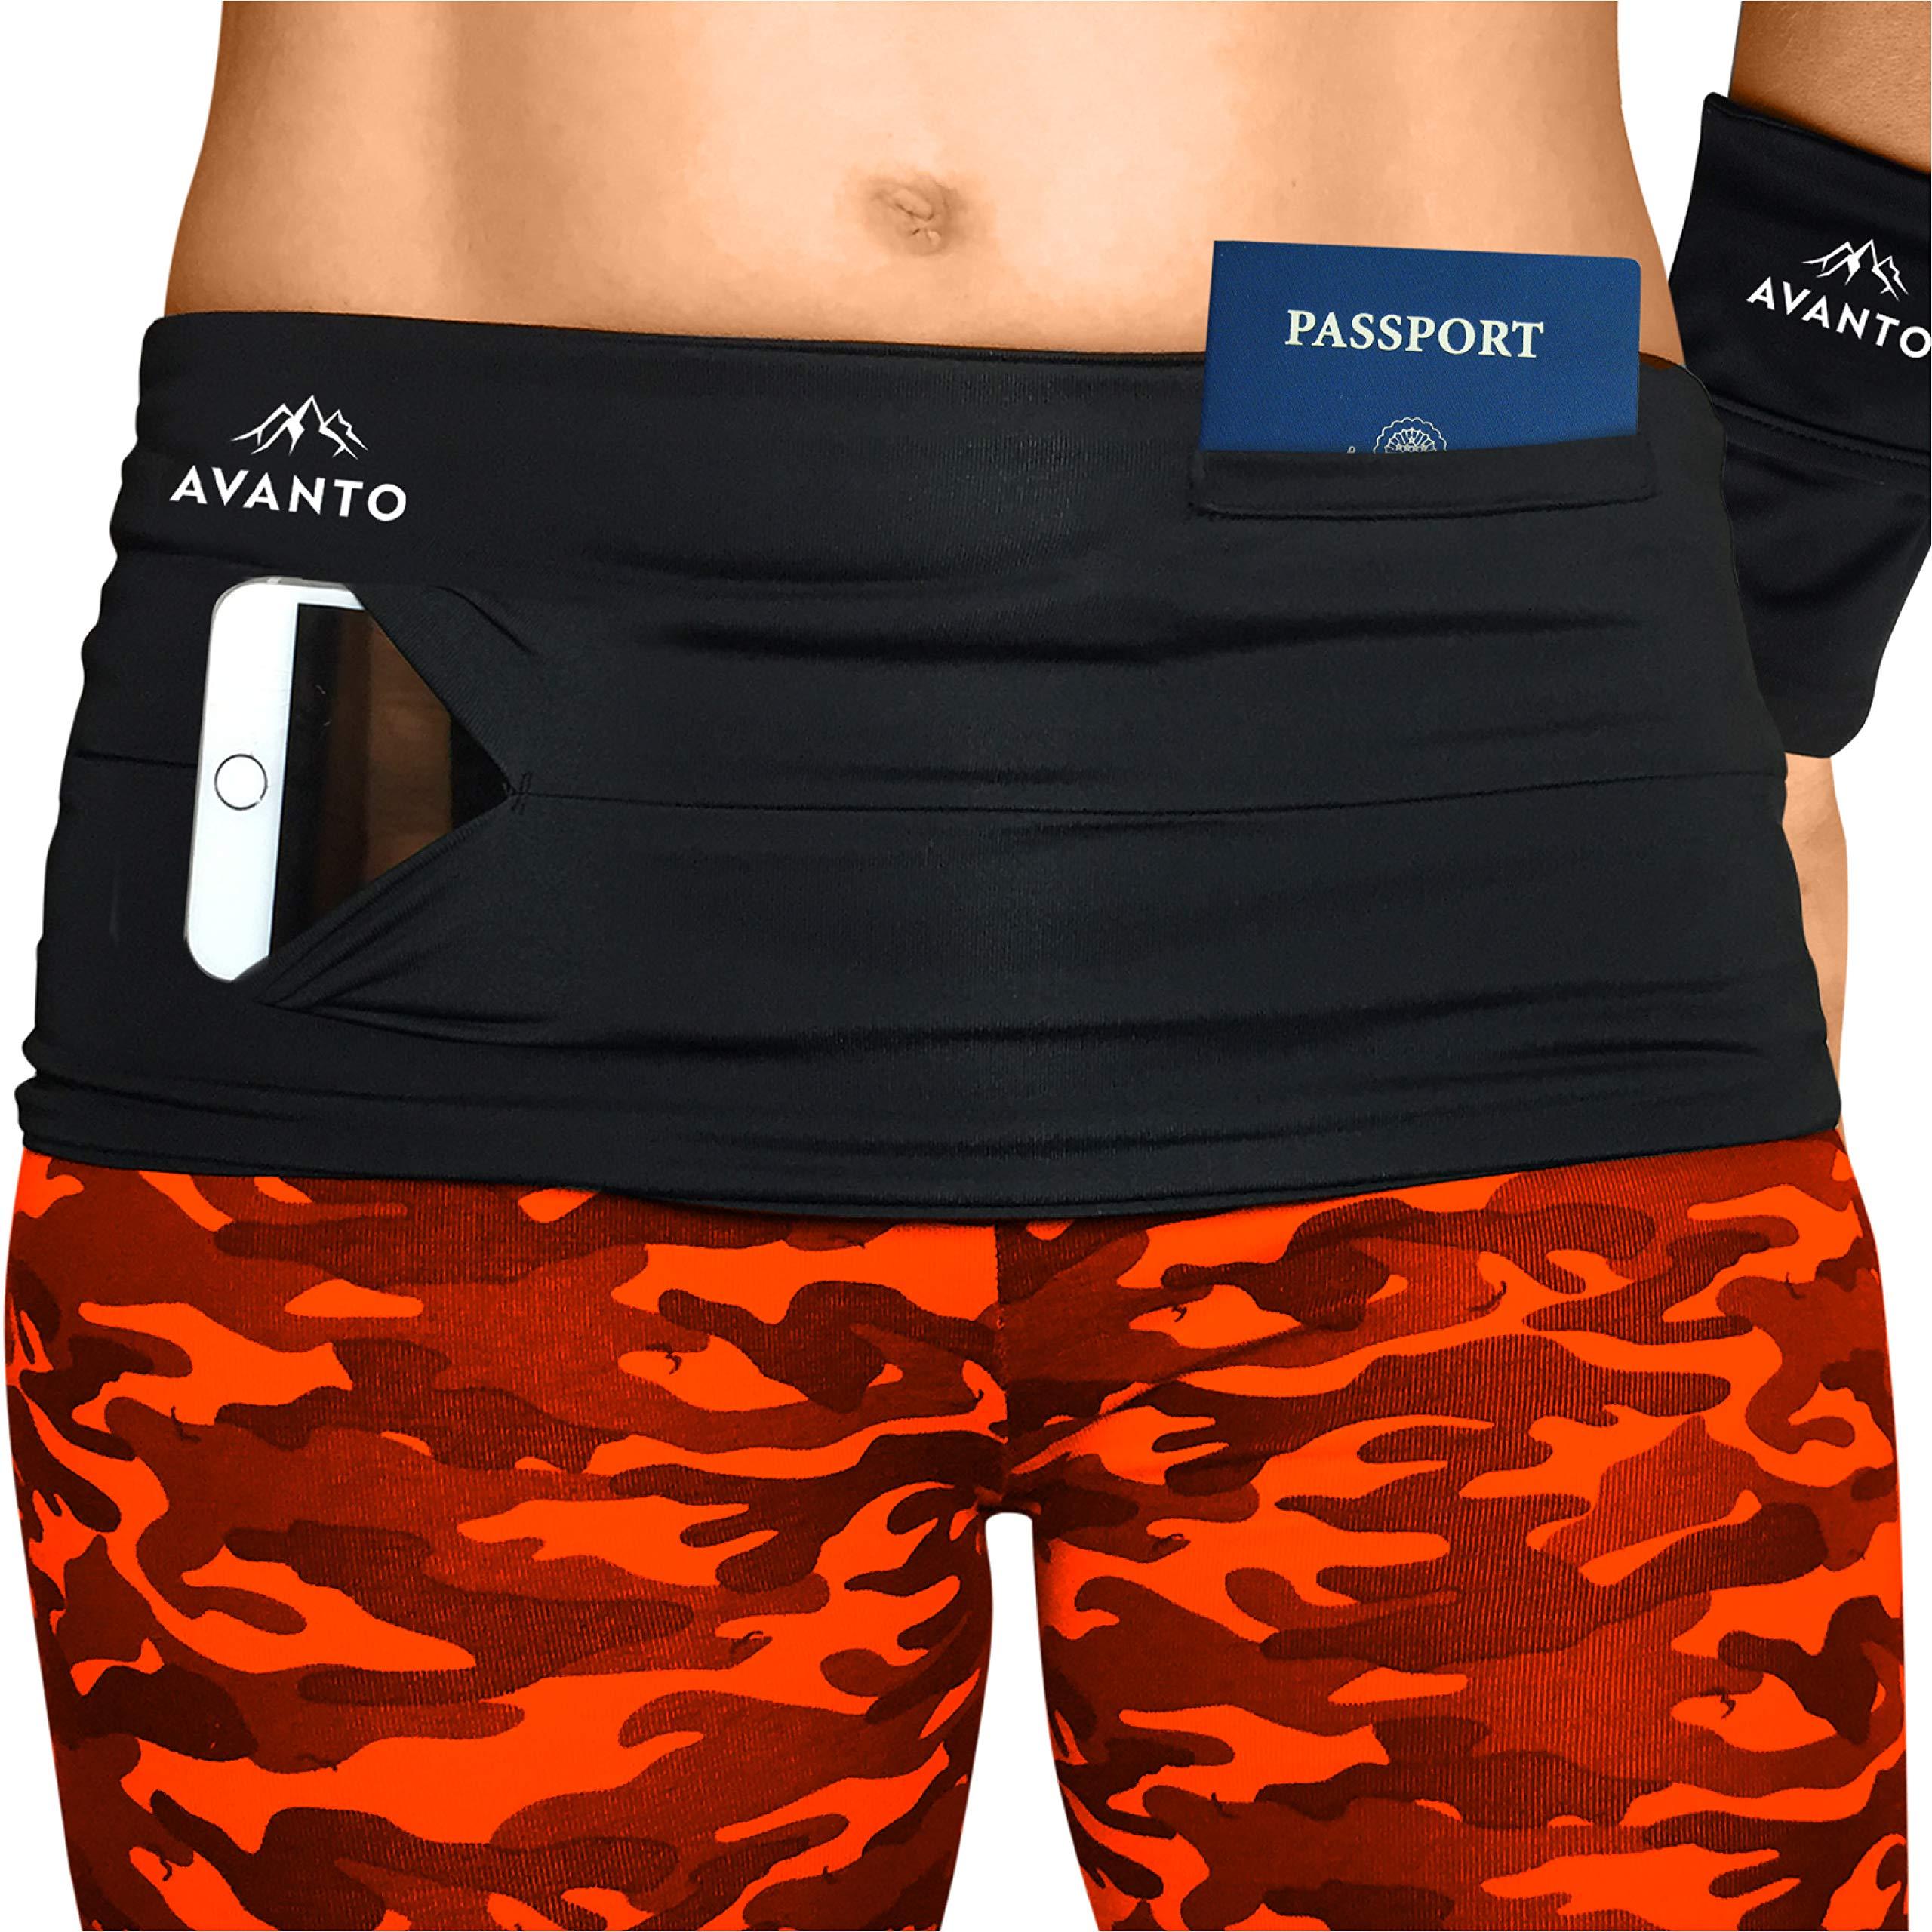 AVANTO Slim Fit Running Belt with Zippered Wrist Wallet, Phone Holder for Running, Passport Holder, Travel Money Belt, Waist and Fanny Pack for Women and Men, Feels Like Second Skin